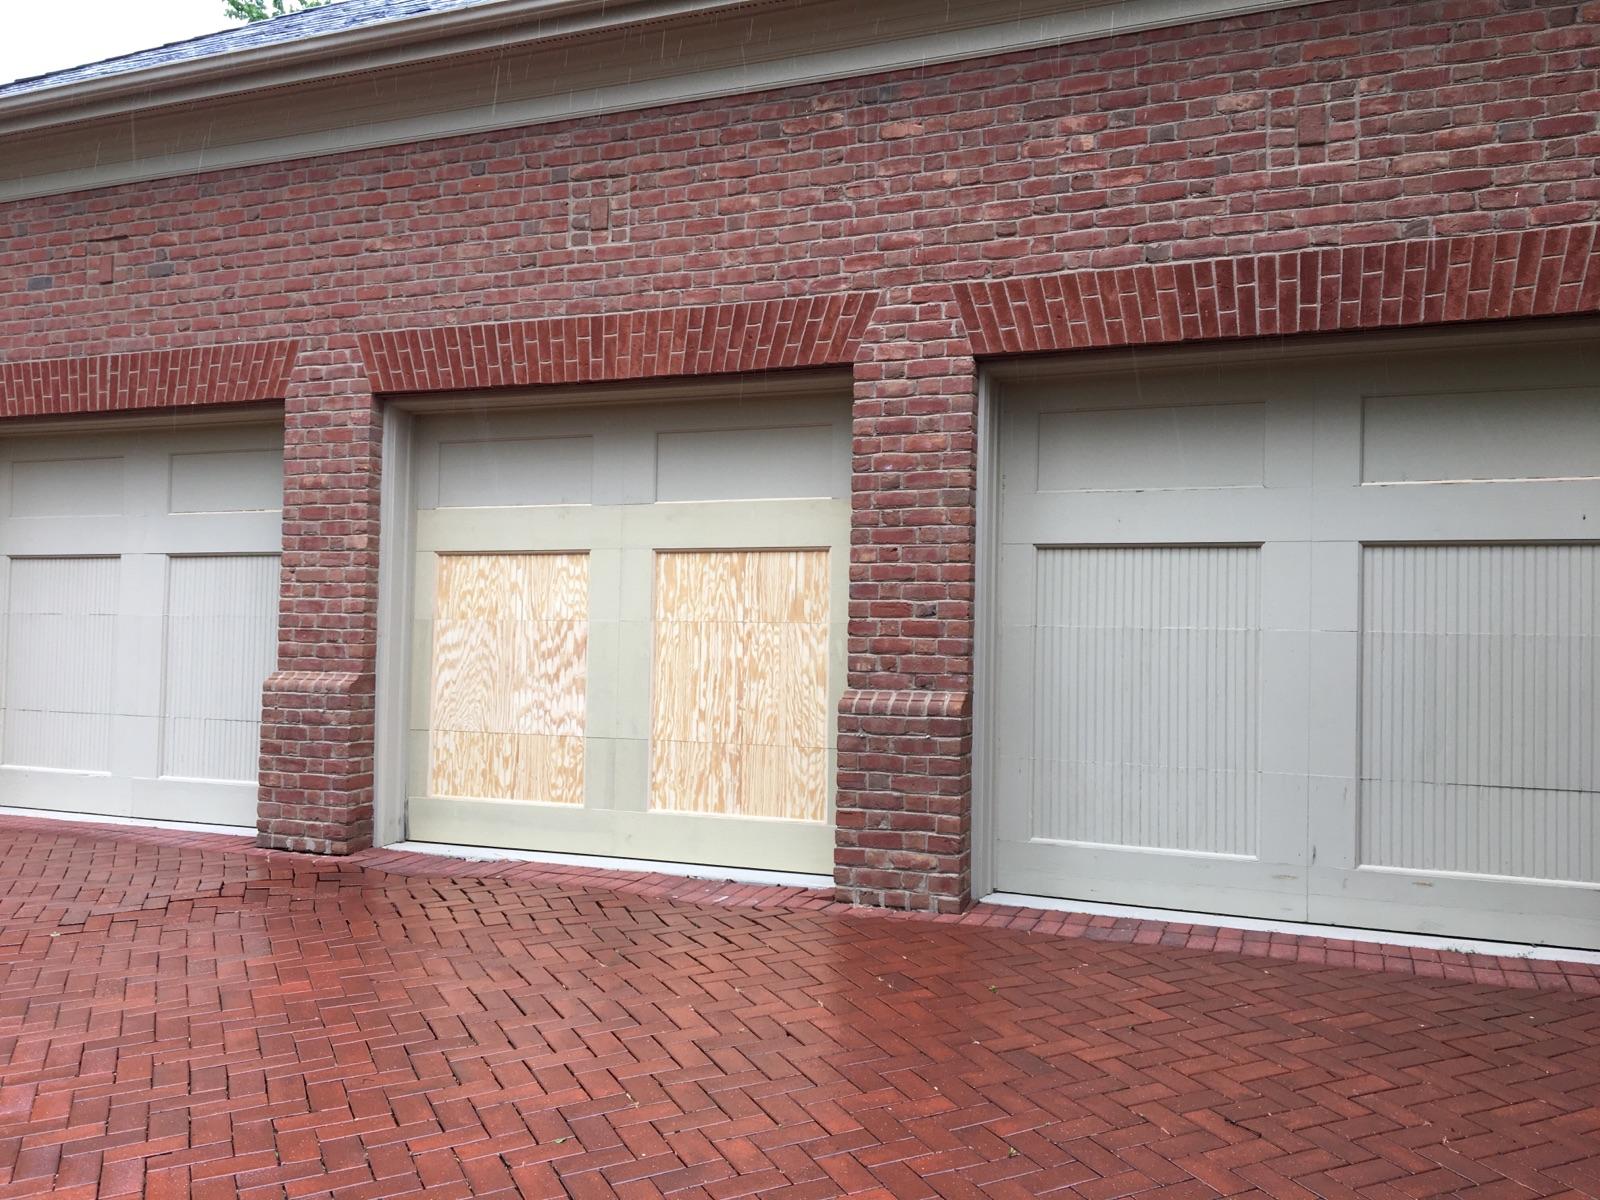 Trim carpentry on a garage door in New Albany Ohio